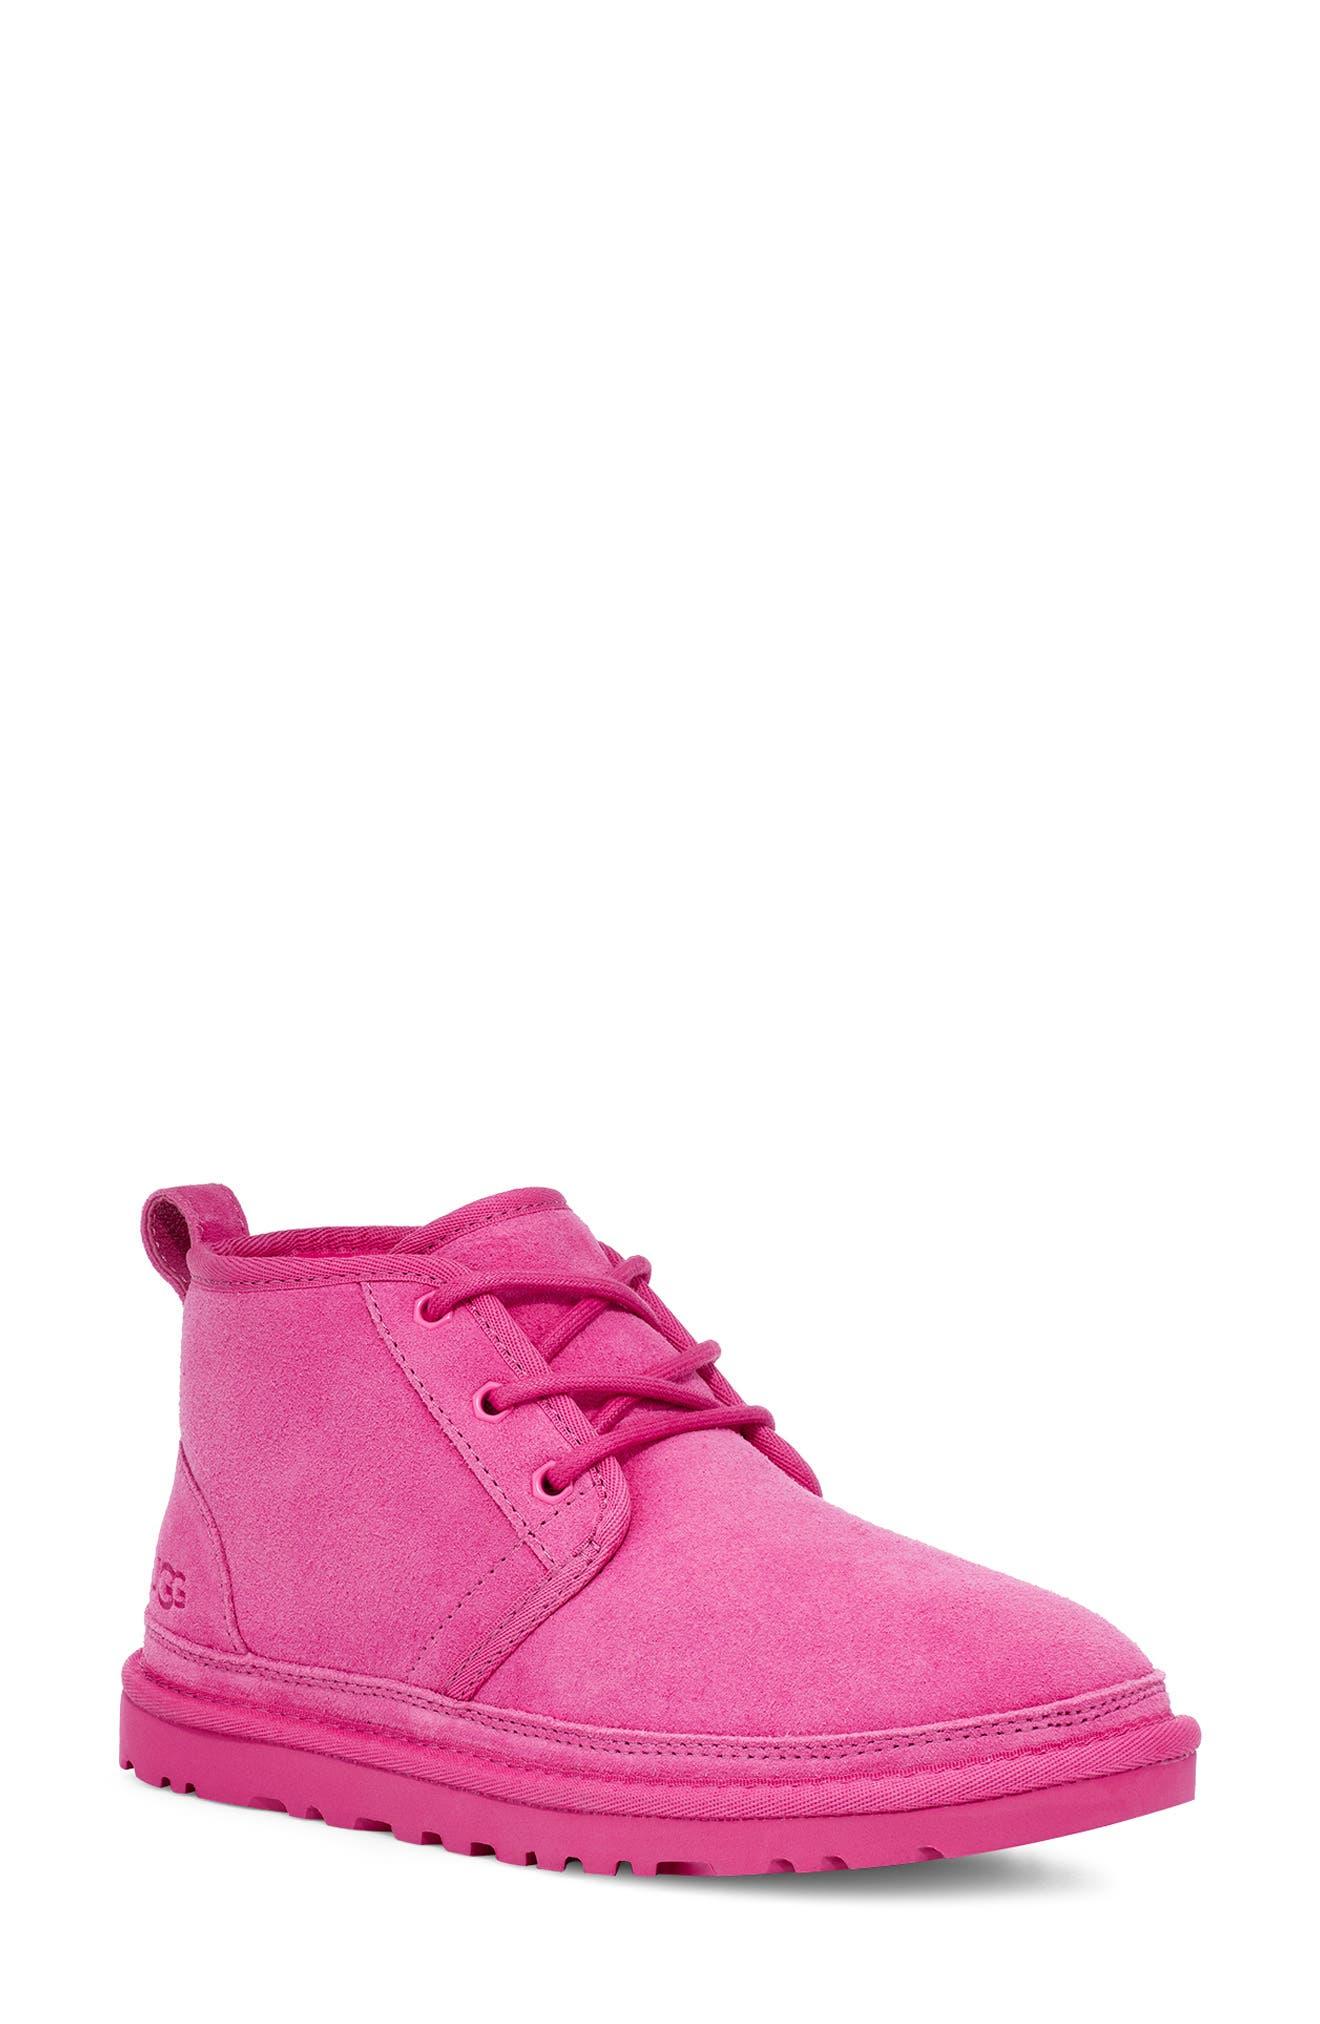 Women's Pink Boots | Nordstrom